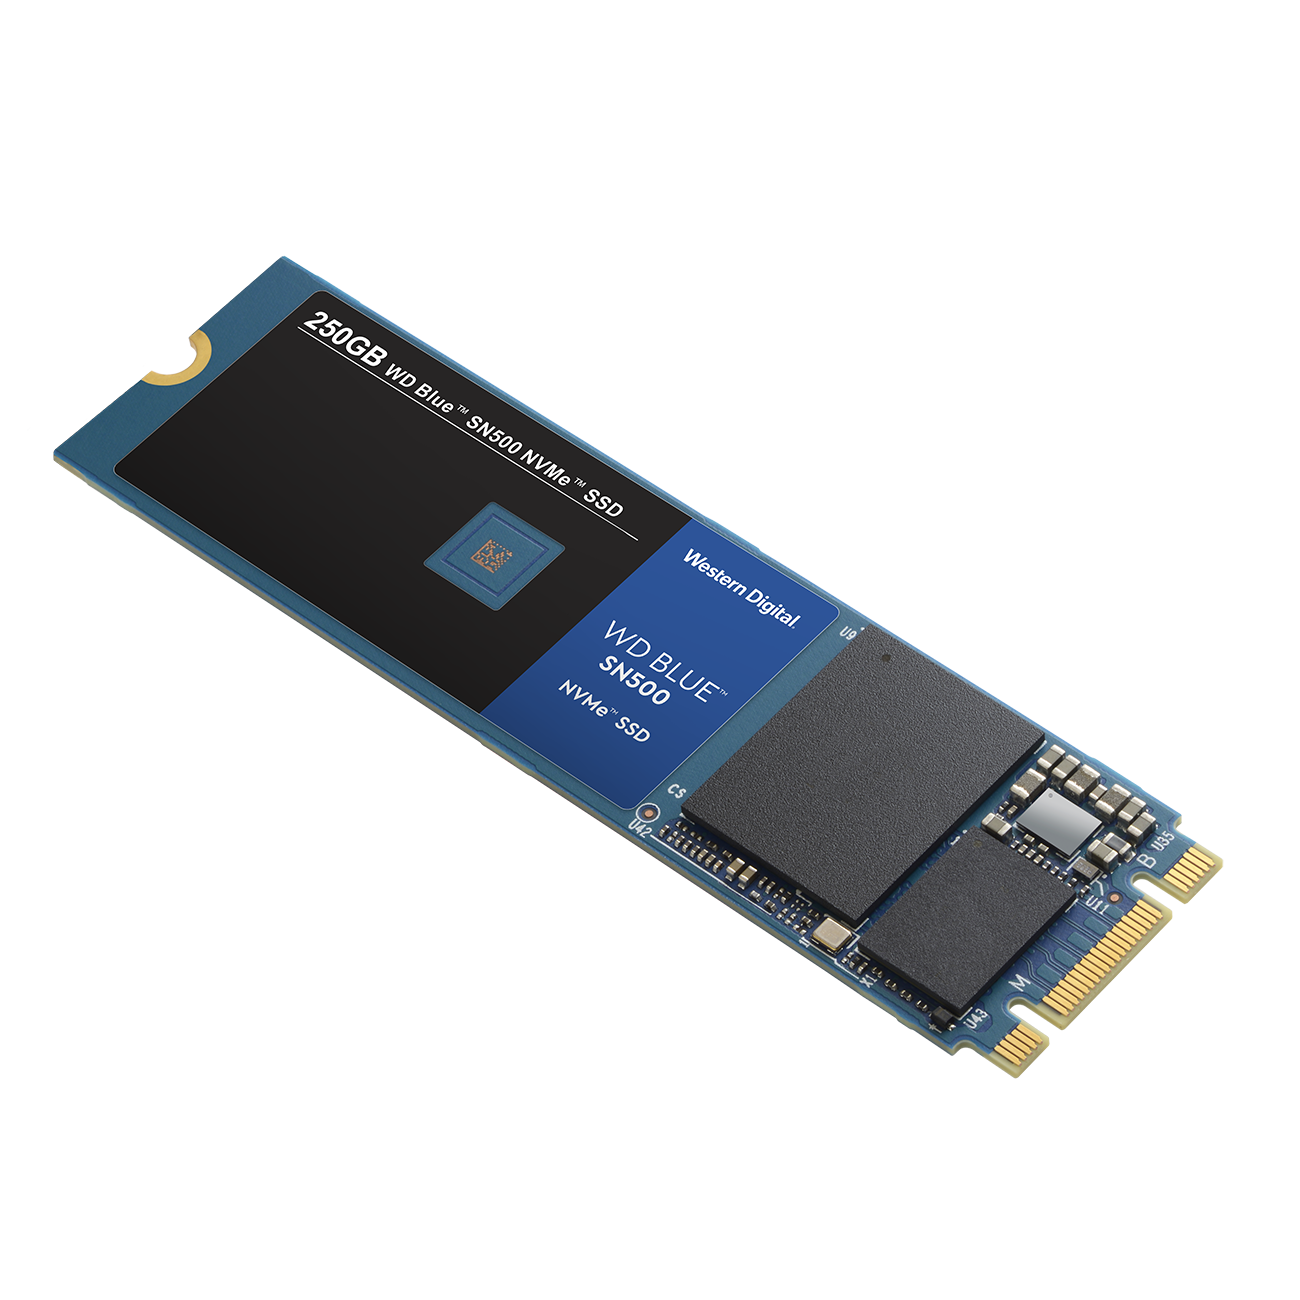 Western Digital 利用 WD Blue 較為親民的定位,推出採用 PCIe 3.0 x2 NVMe 介面規範的 WD Blue SN500 NVMe SSD,預計推出 250GB、500GB 容量版本